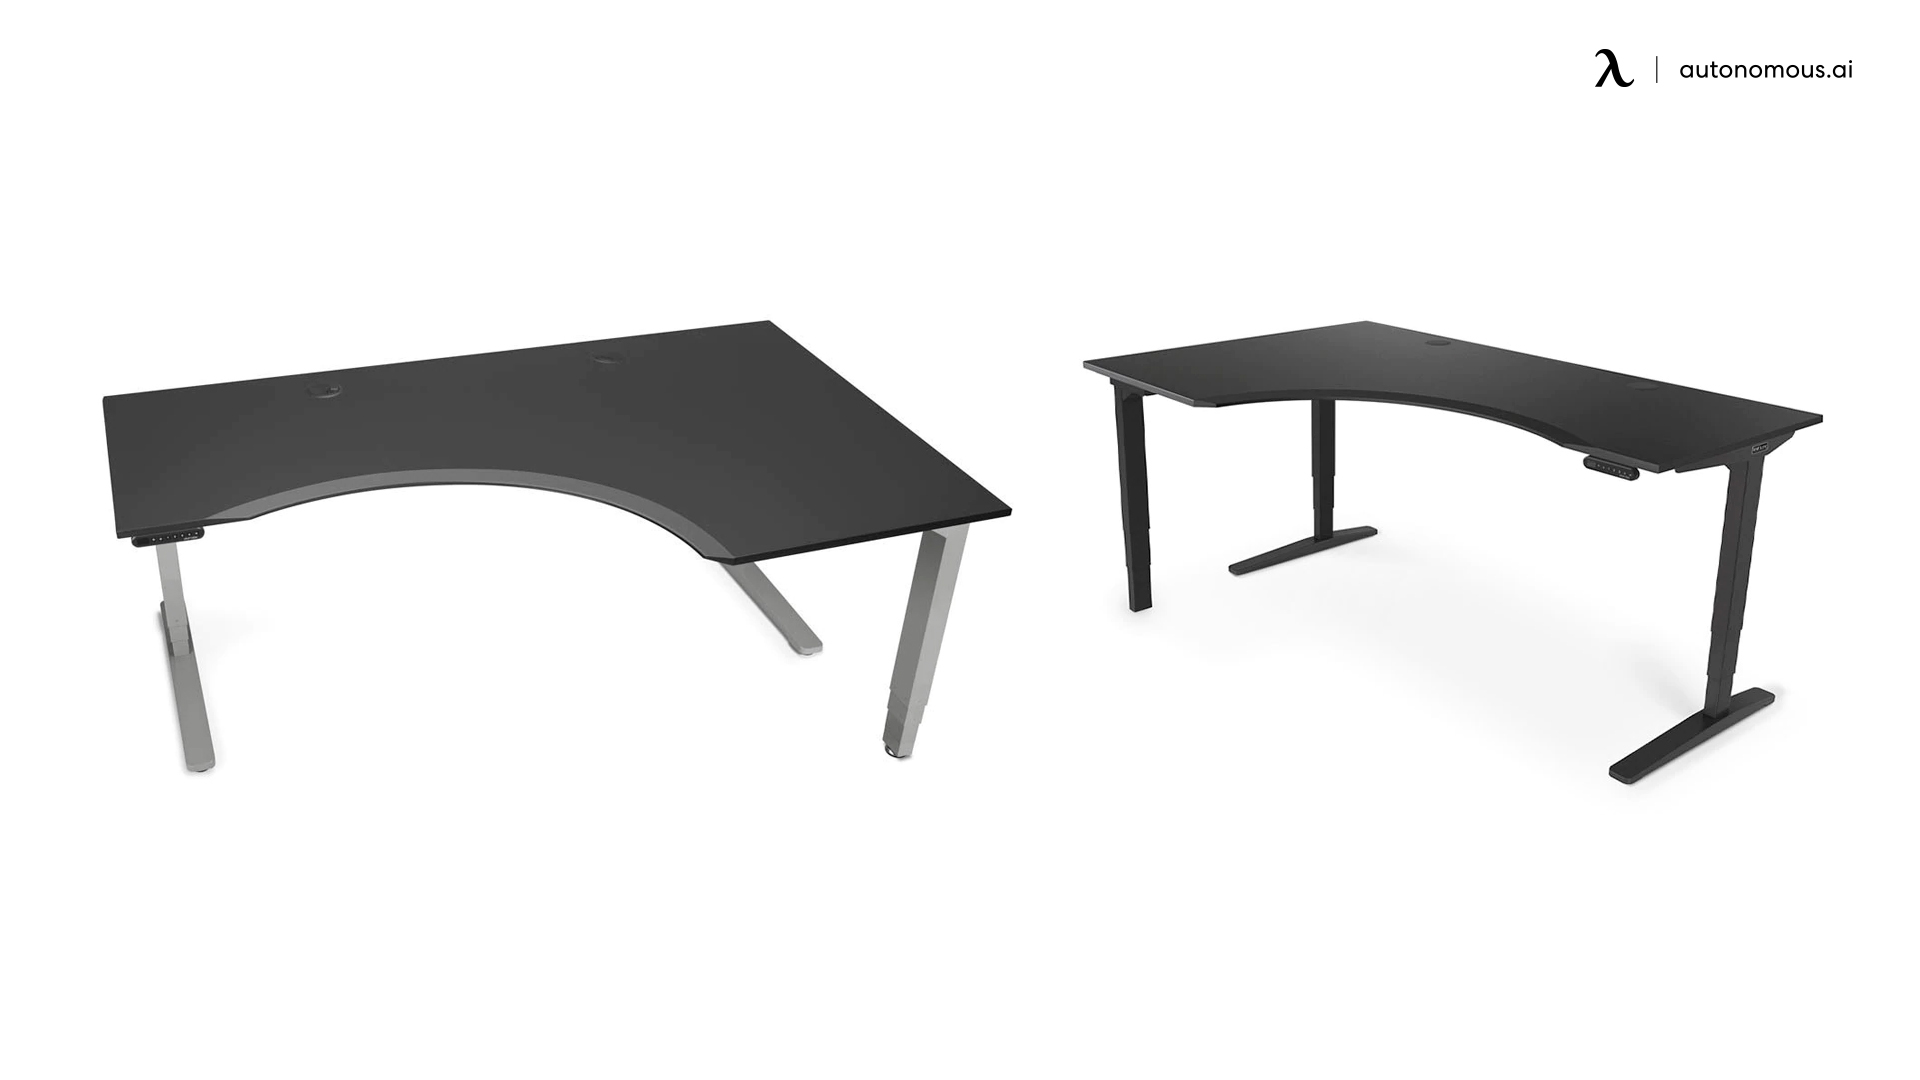 Uplift Curved L-Shaped Stand-up Desk